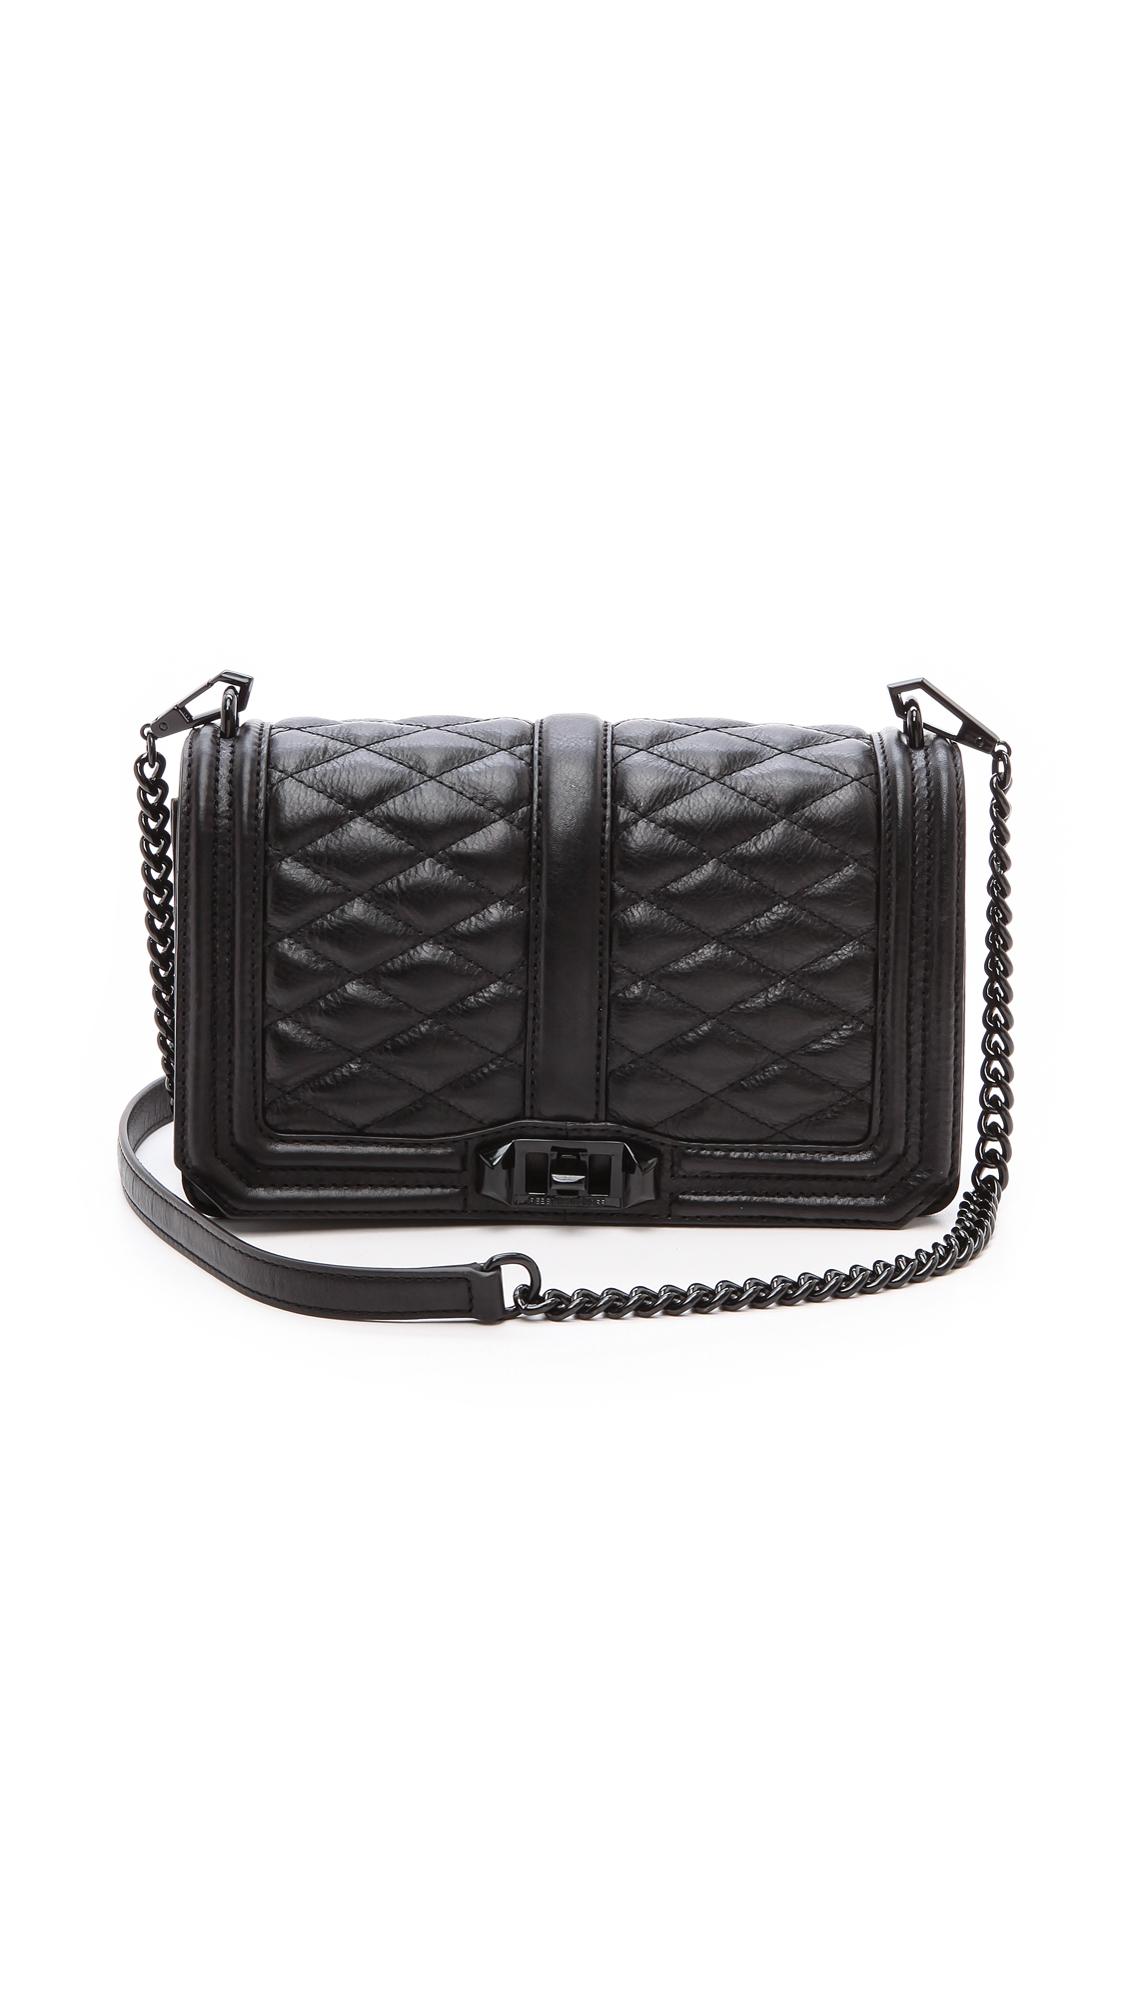 9cdb9a48543de3 Rebecca Minkoff Love Quilted Crossbody Bag Black | Stanford Center ...